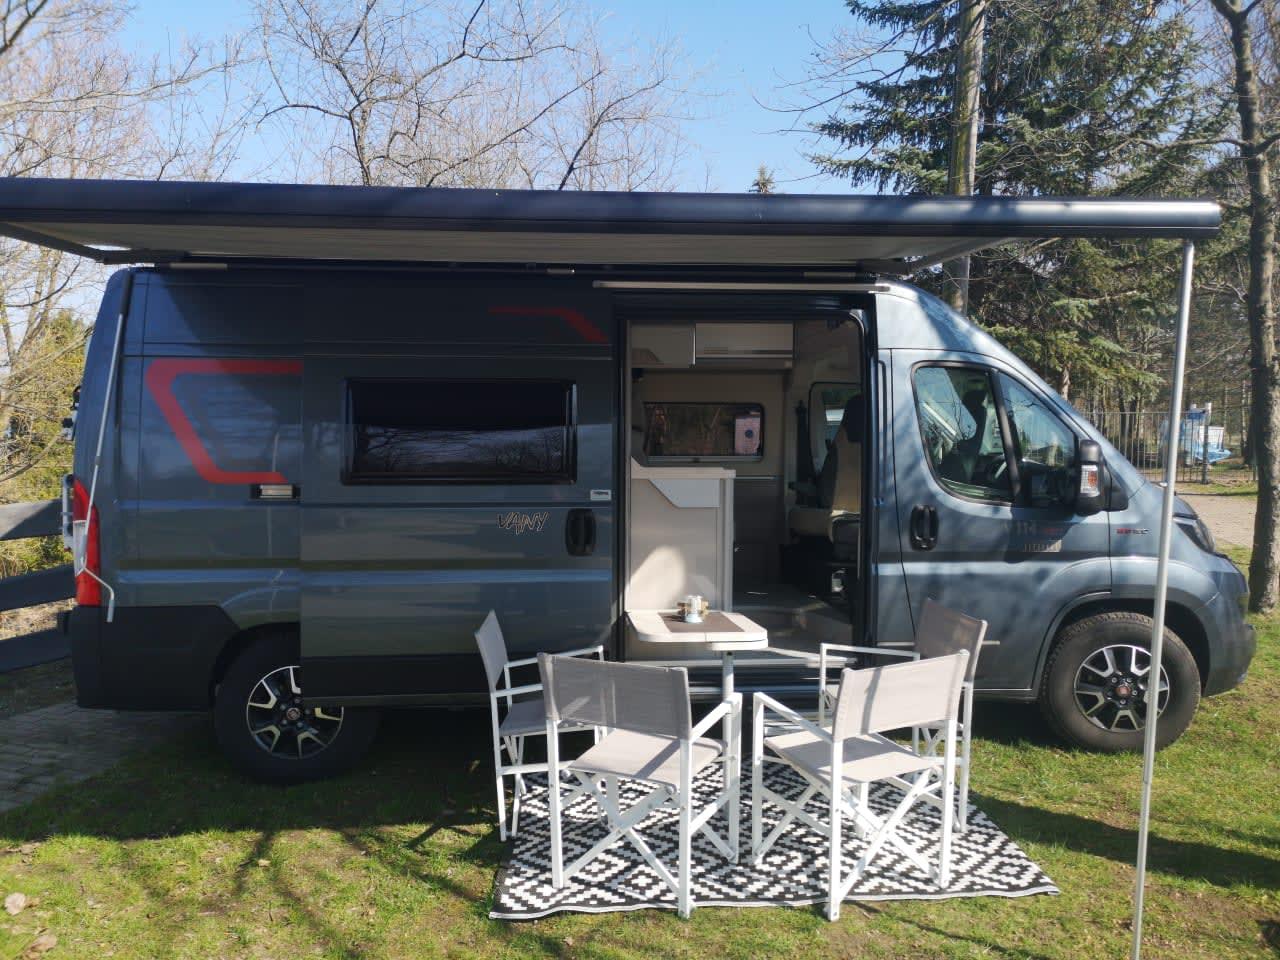 Wohnmobil Challenger Vany 114 MAX